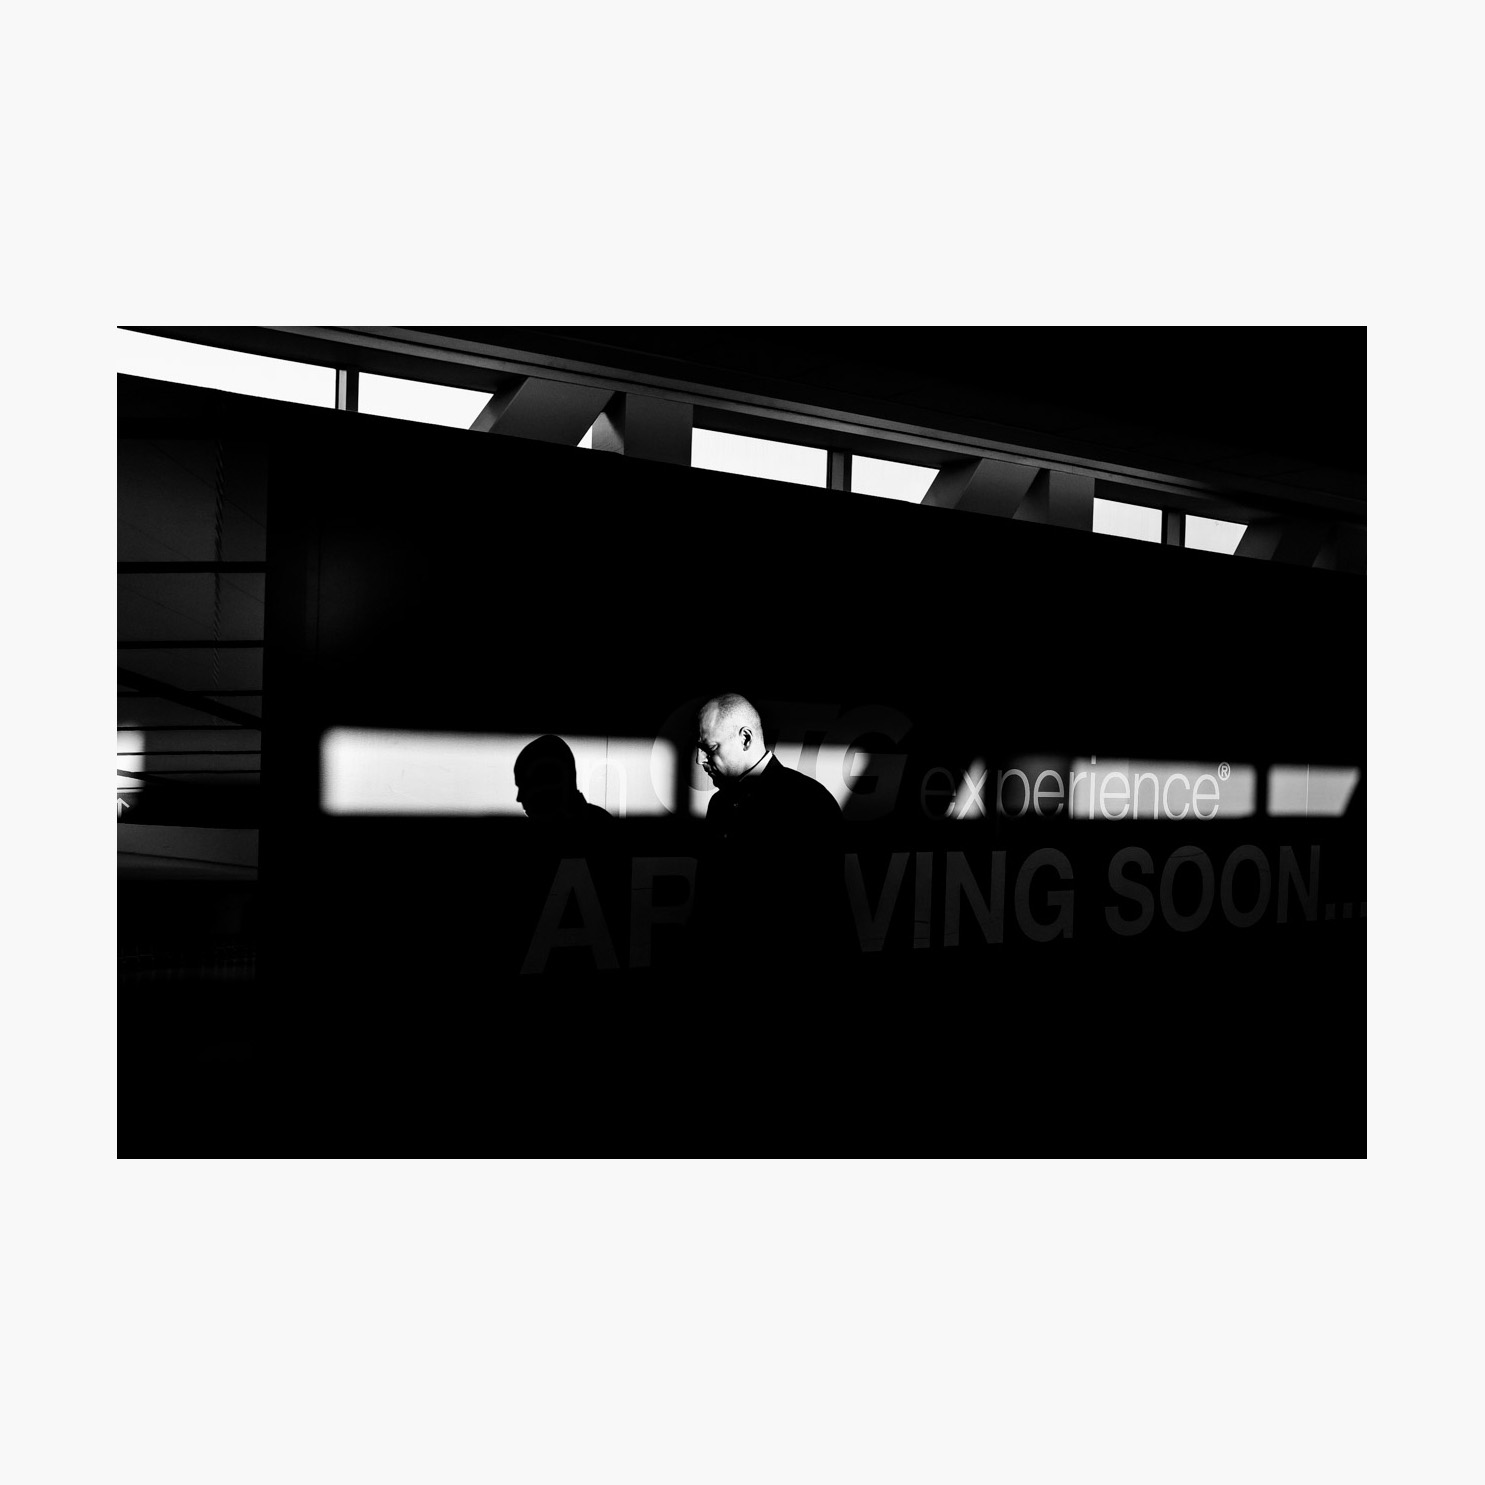 ©-Harry-W-Edmonds-2018-@photographersnote-the-long-road-PN05.jpg